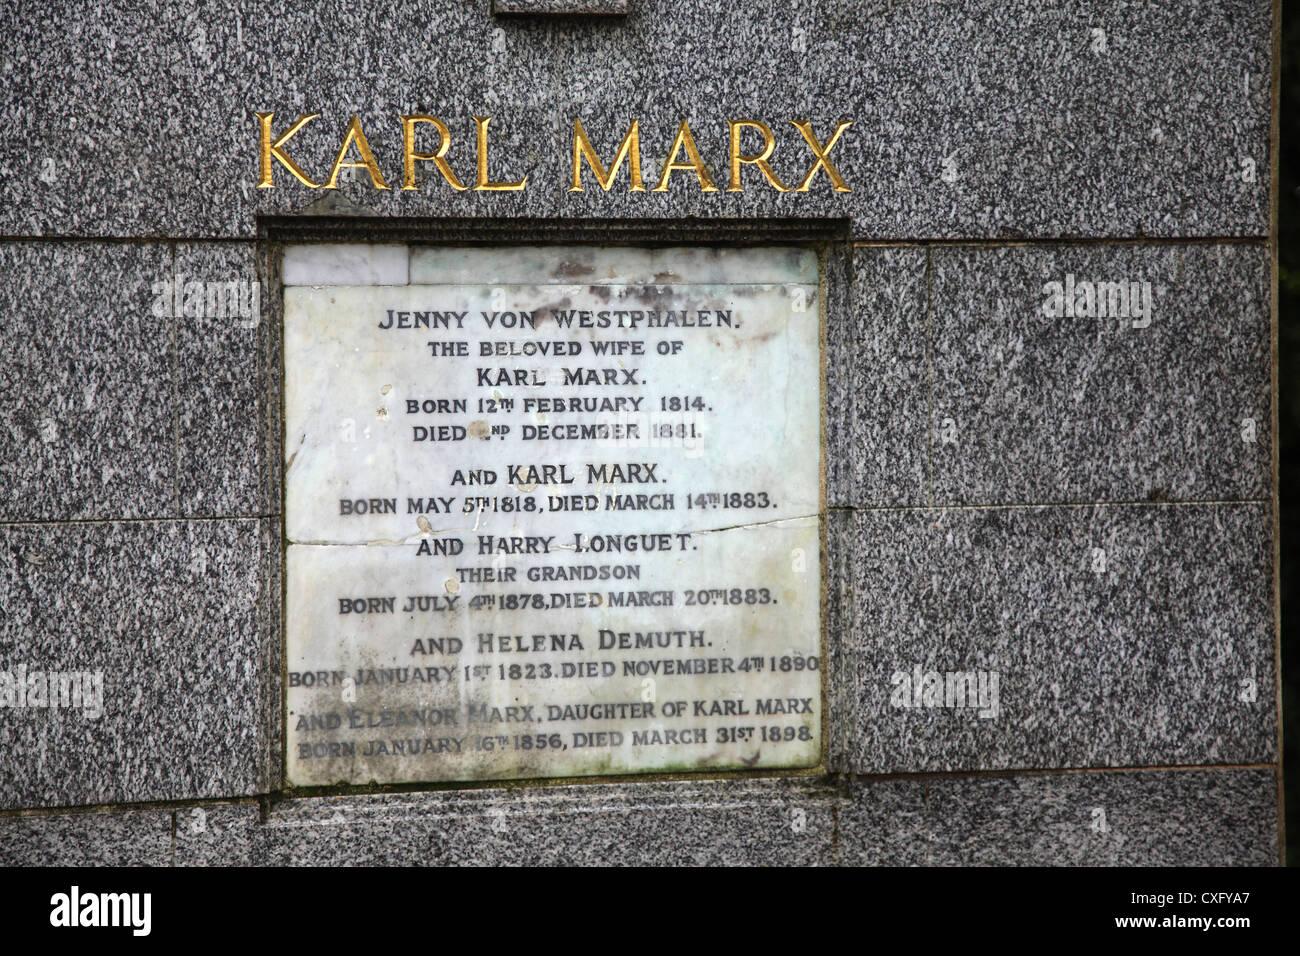 Karl Marx Grave inscription at Highgate Cemetery London - Stock Image